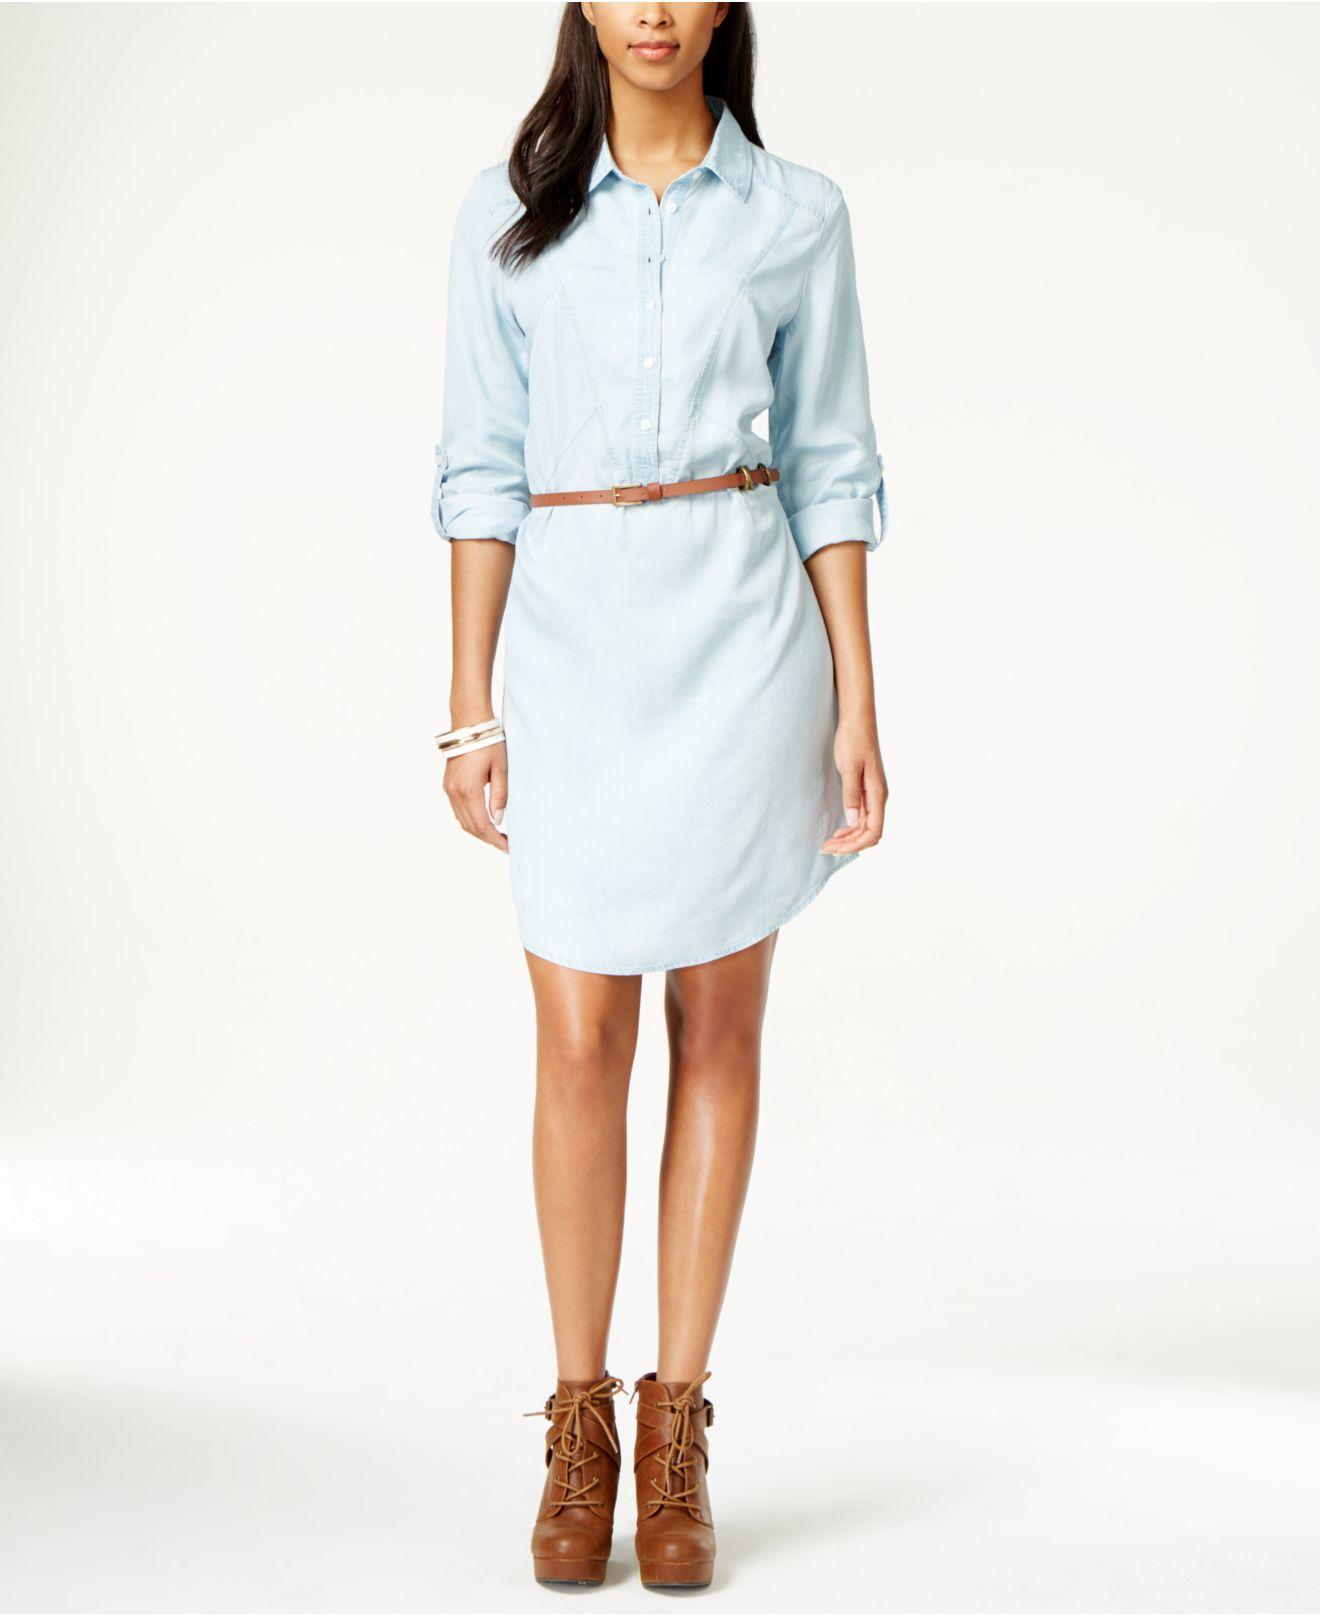 397de028a65 Eci Belted Light Wash Denim Shirtdress in Blue - Lyst